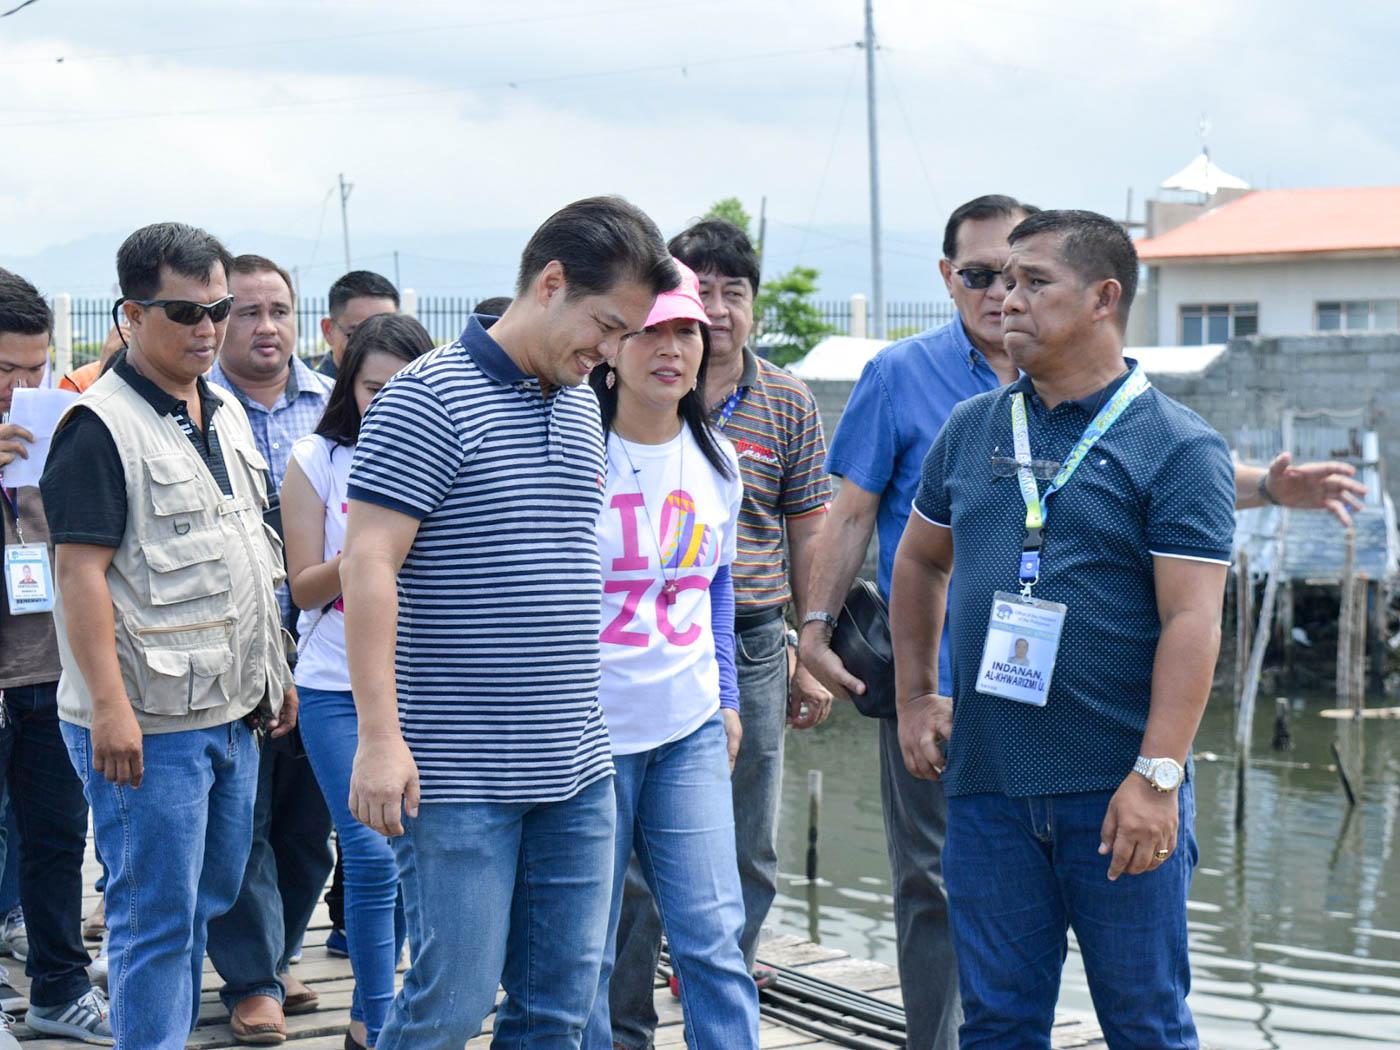 iNSPECTION. From left: Negros Occidental Representative Albee Benitez (in stripes), Zamboanga City Mayor Beng Climaco, and Zamboanga City Representative Celso Lobregat (partly hidden, in blue)